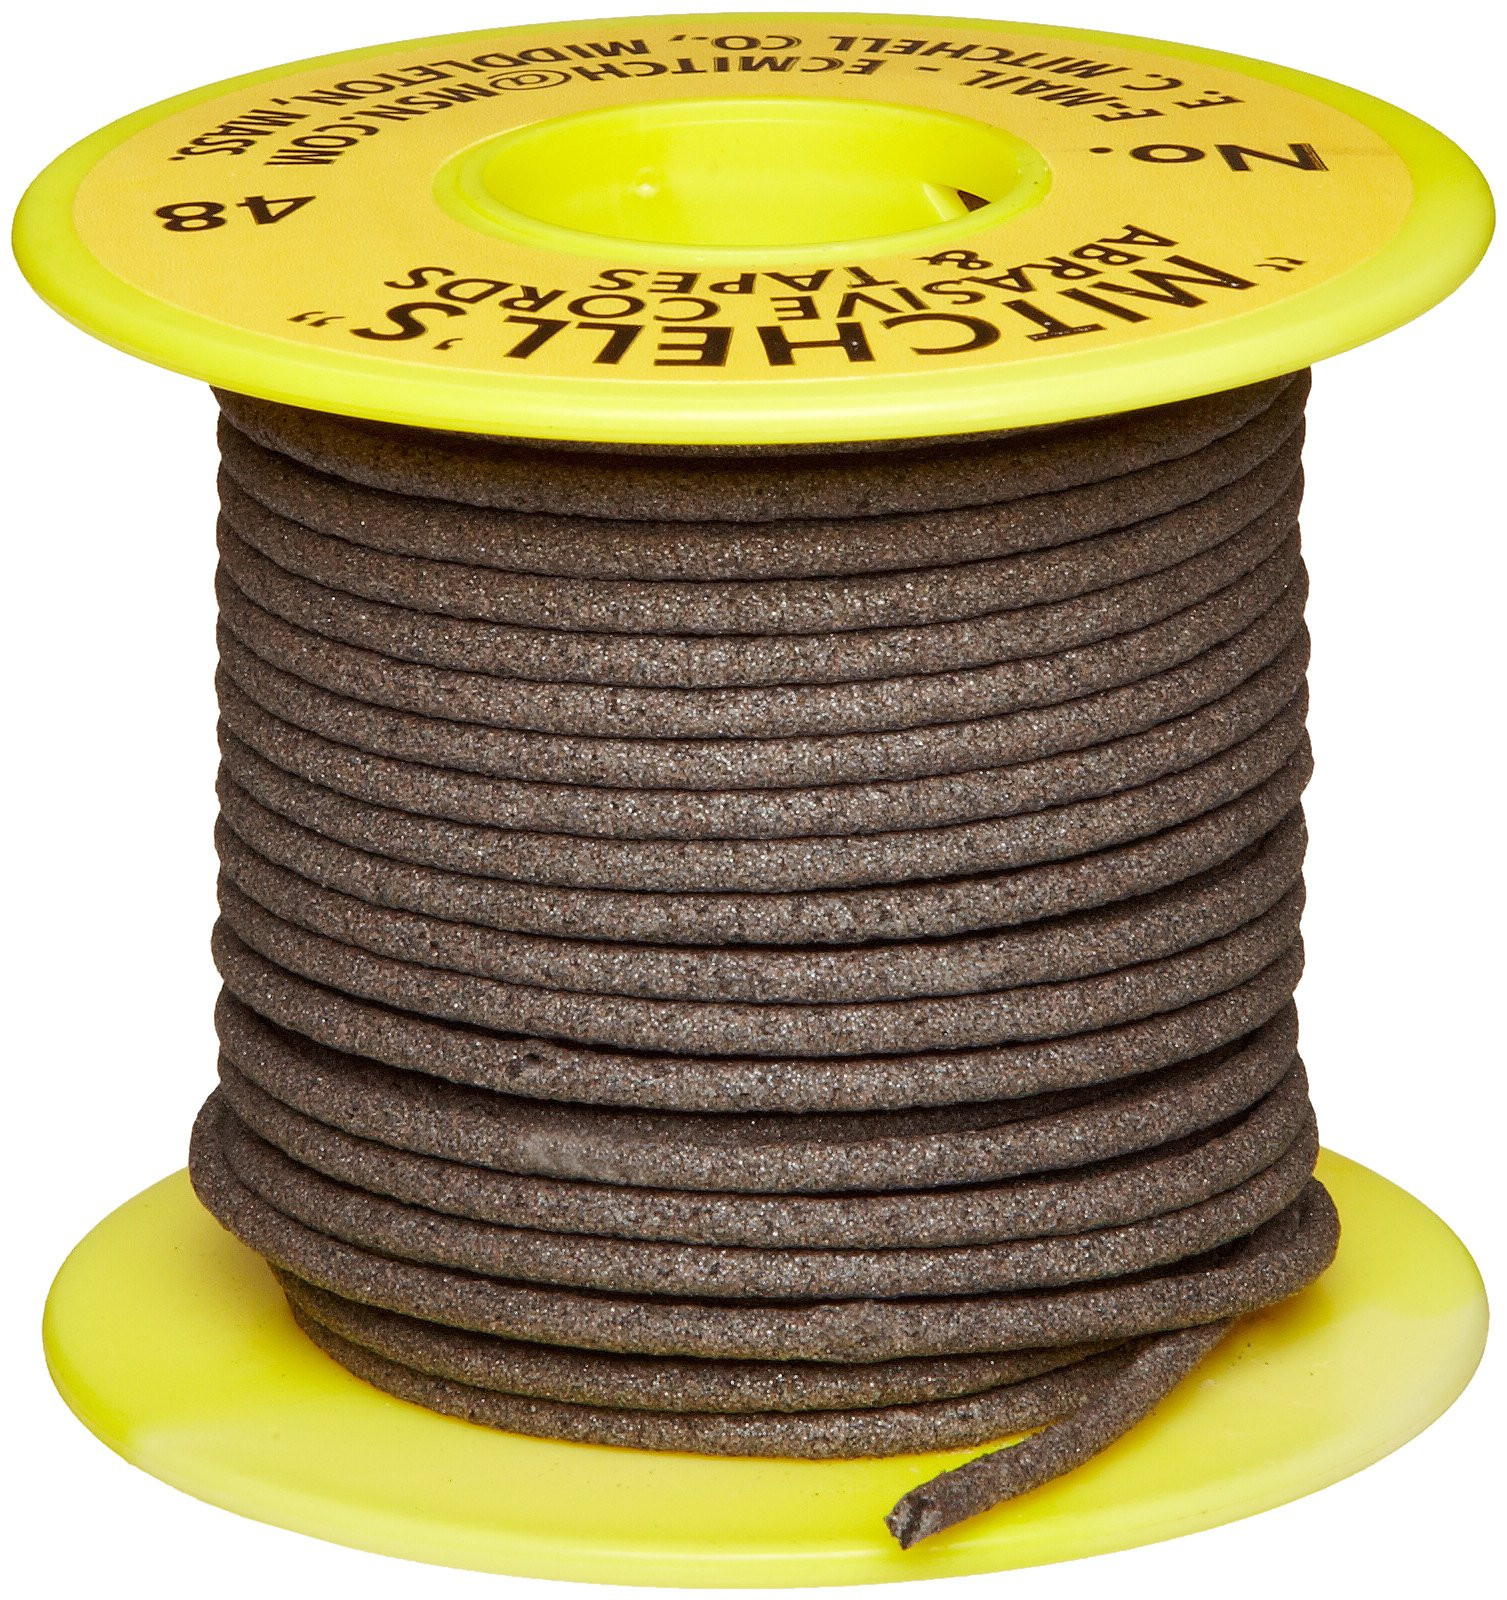 Mitchell Abrasives 48 Round Abrasive Cord, Aluminum Oxide 150 Grit .093'' Diameter x 50 Feet